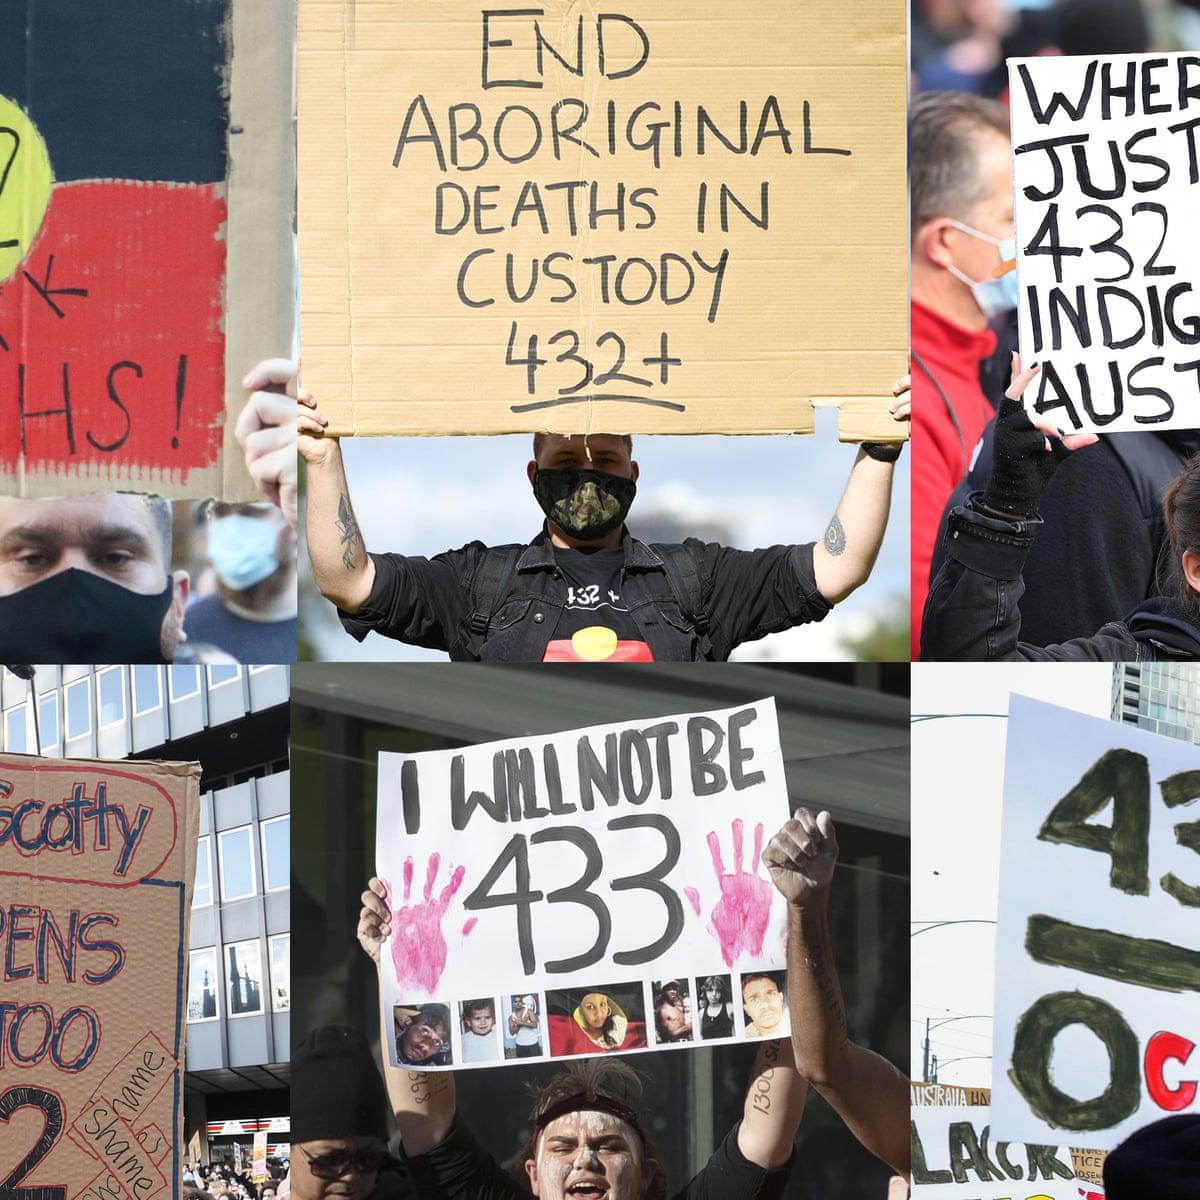 Aboriginal dating australia online dating personal ads